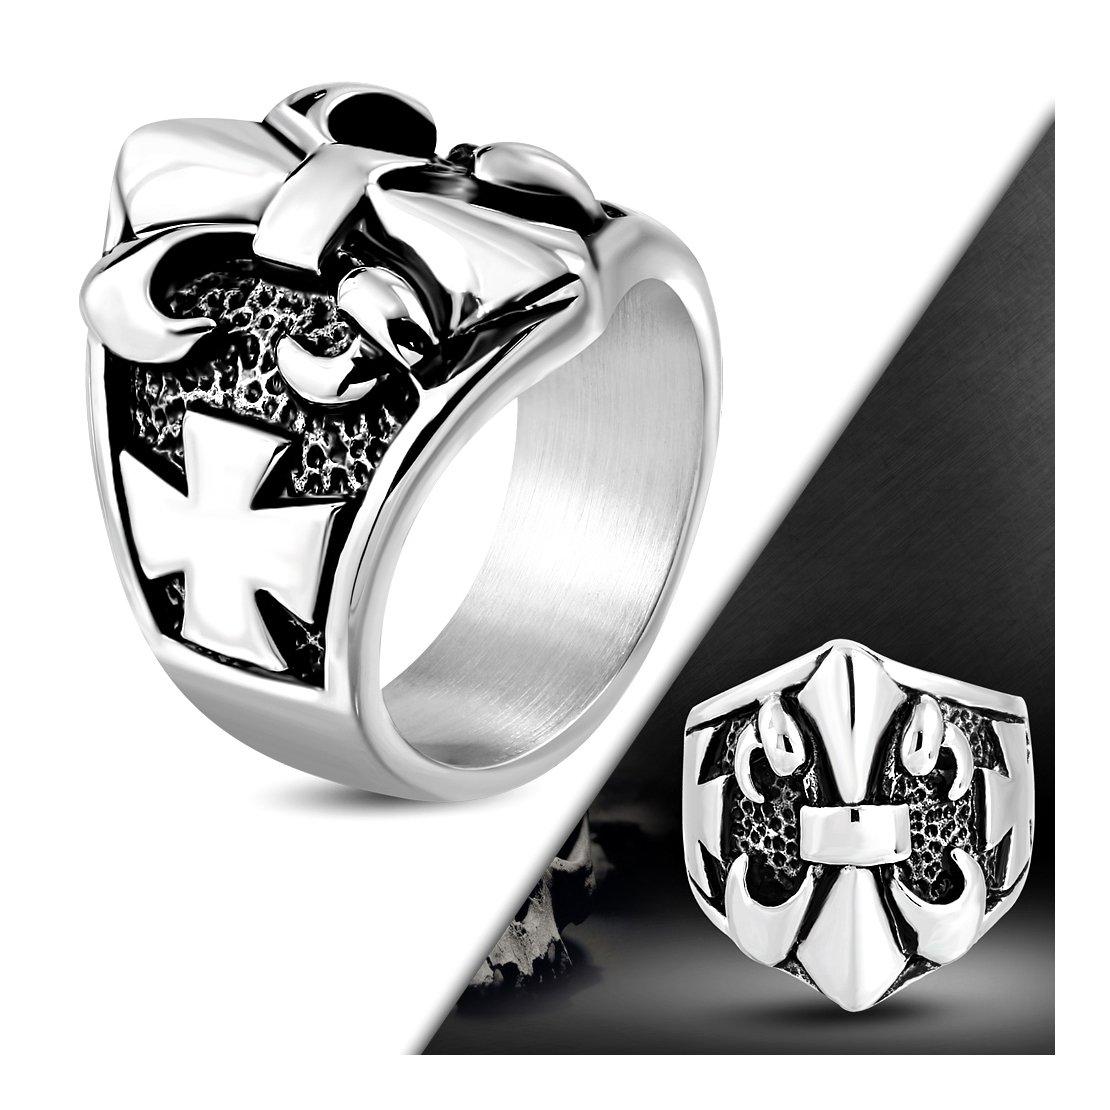 Stainless Steel 2 Color Pattee /& Fleur De Lis Flower Cross Biker Ring